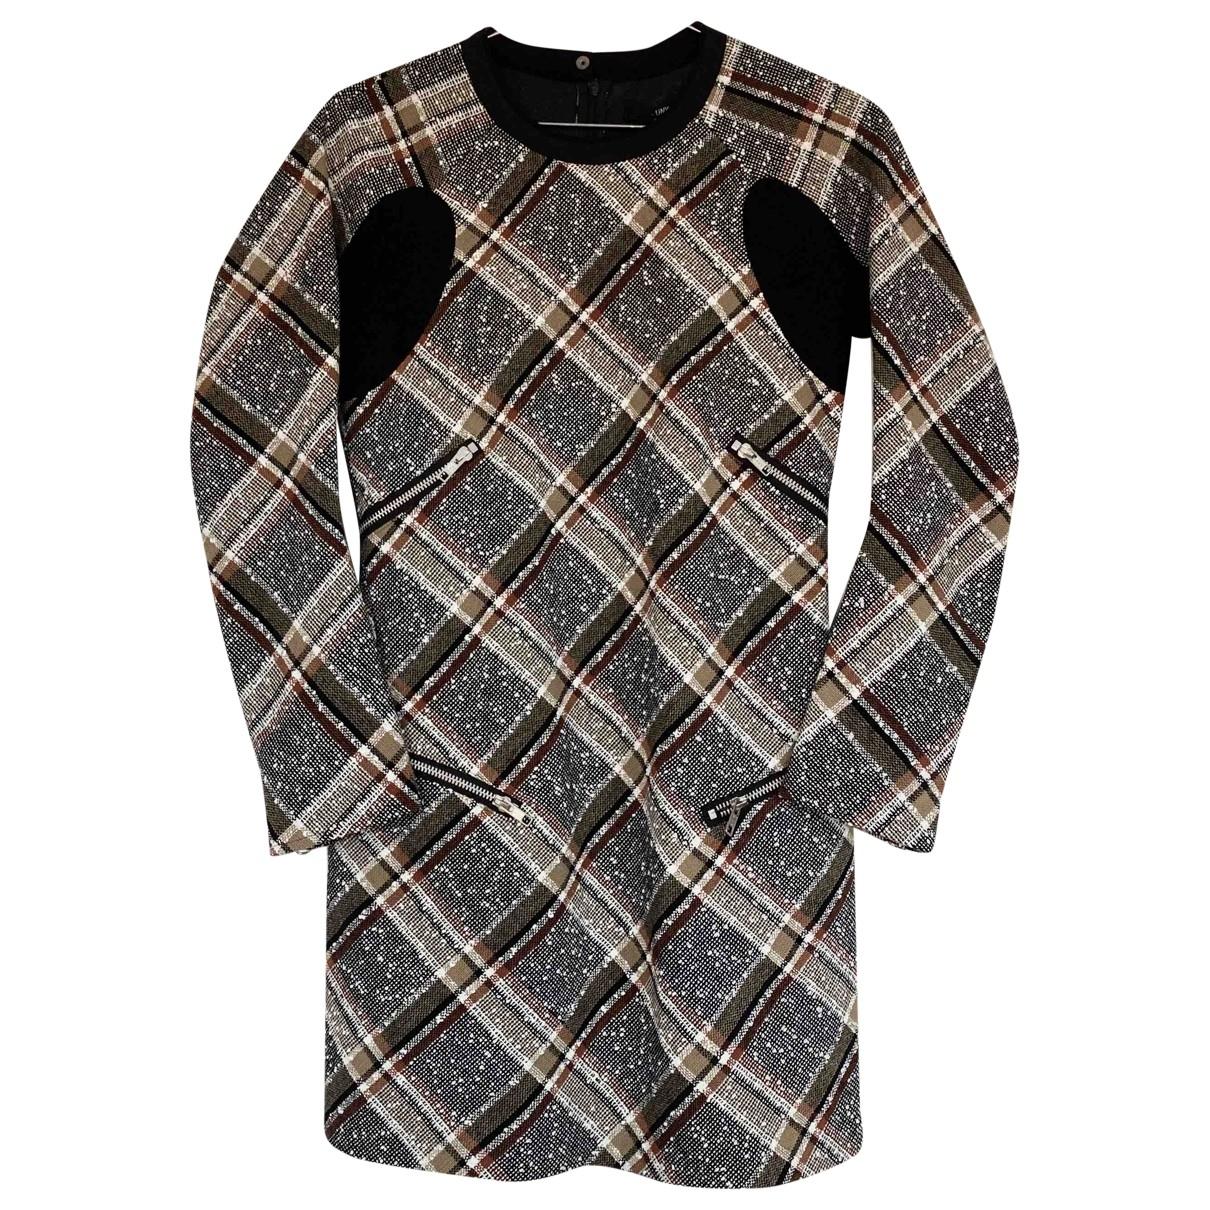 Comme Des Garcons \N Multicolour Wool dress for Women S International